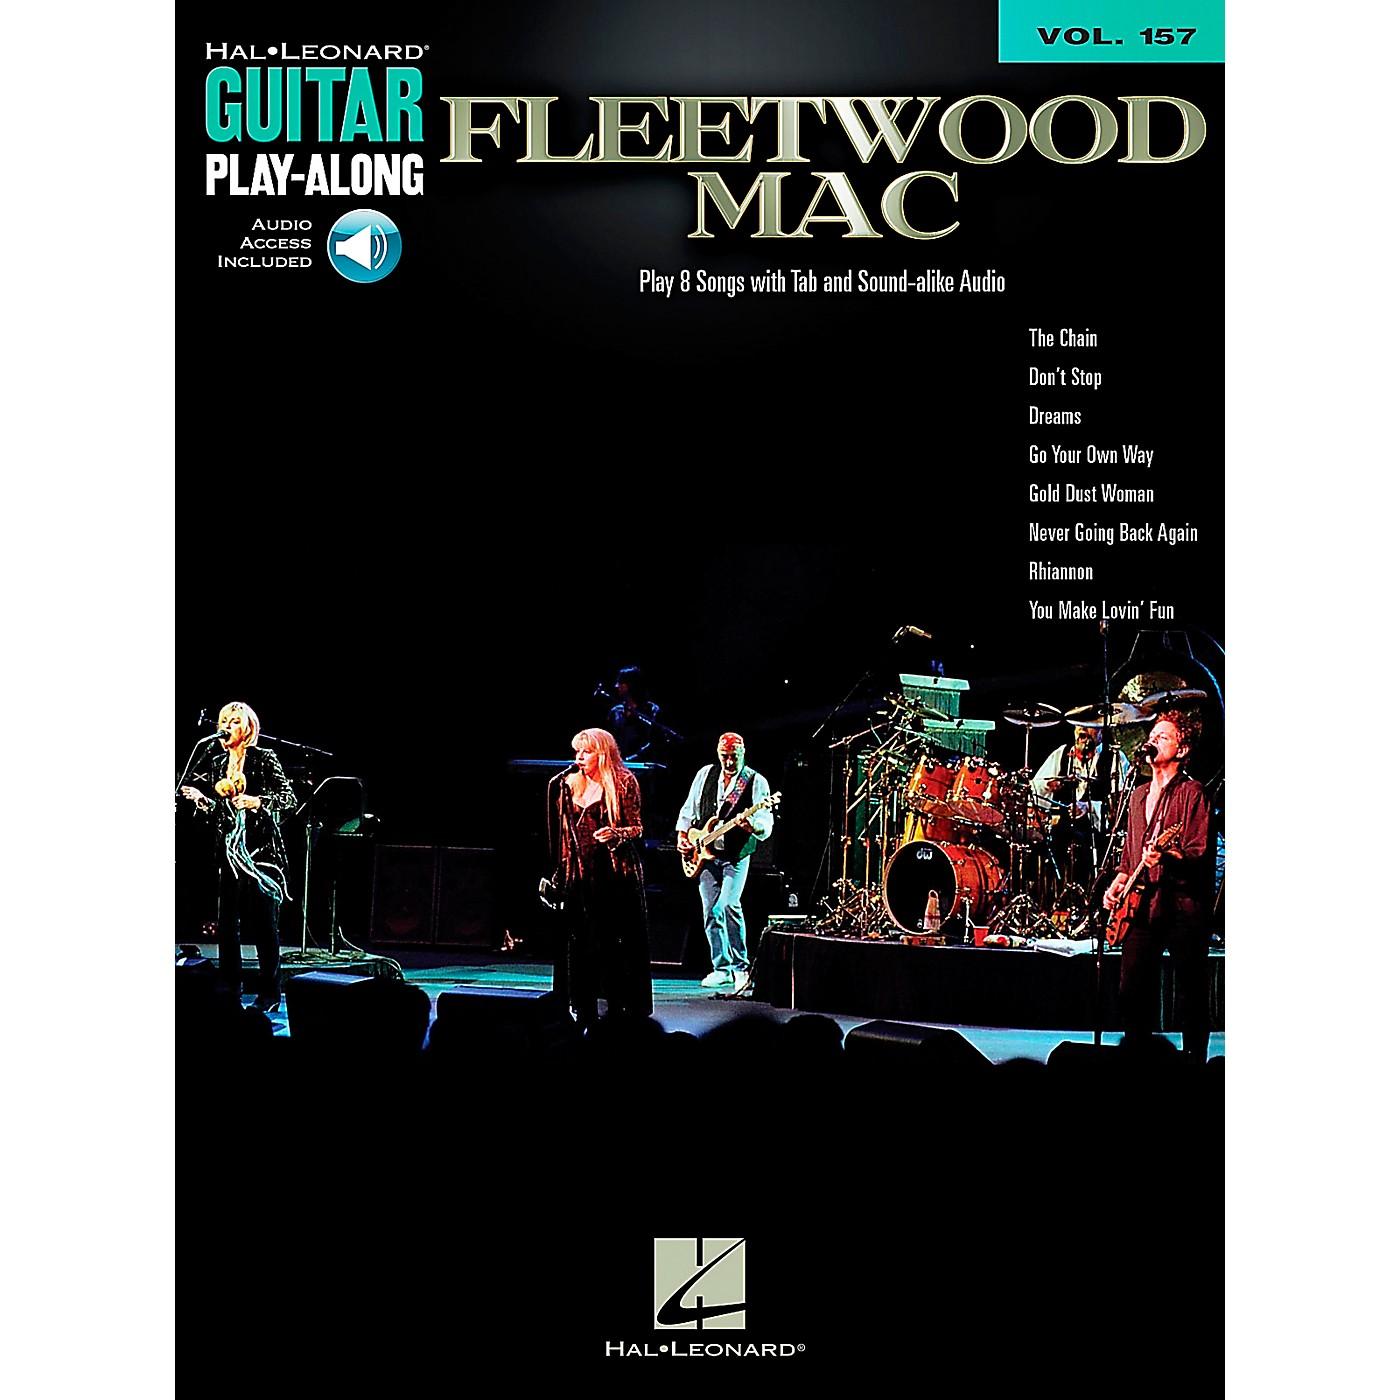 Hal Leonard Fleetwood Mac - Guitar Play-Along Book/CD Vol. 157 thumbnail